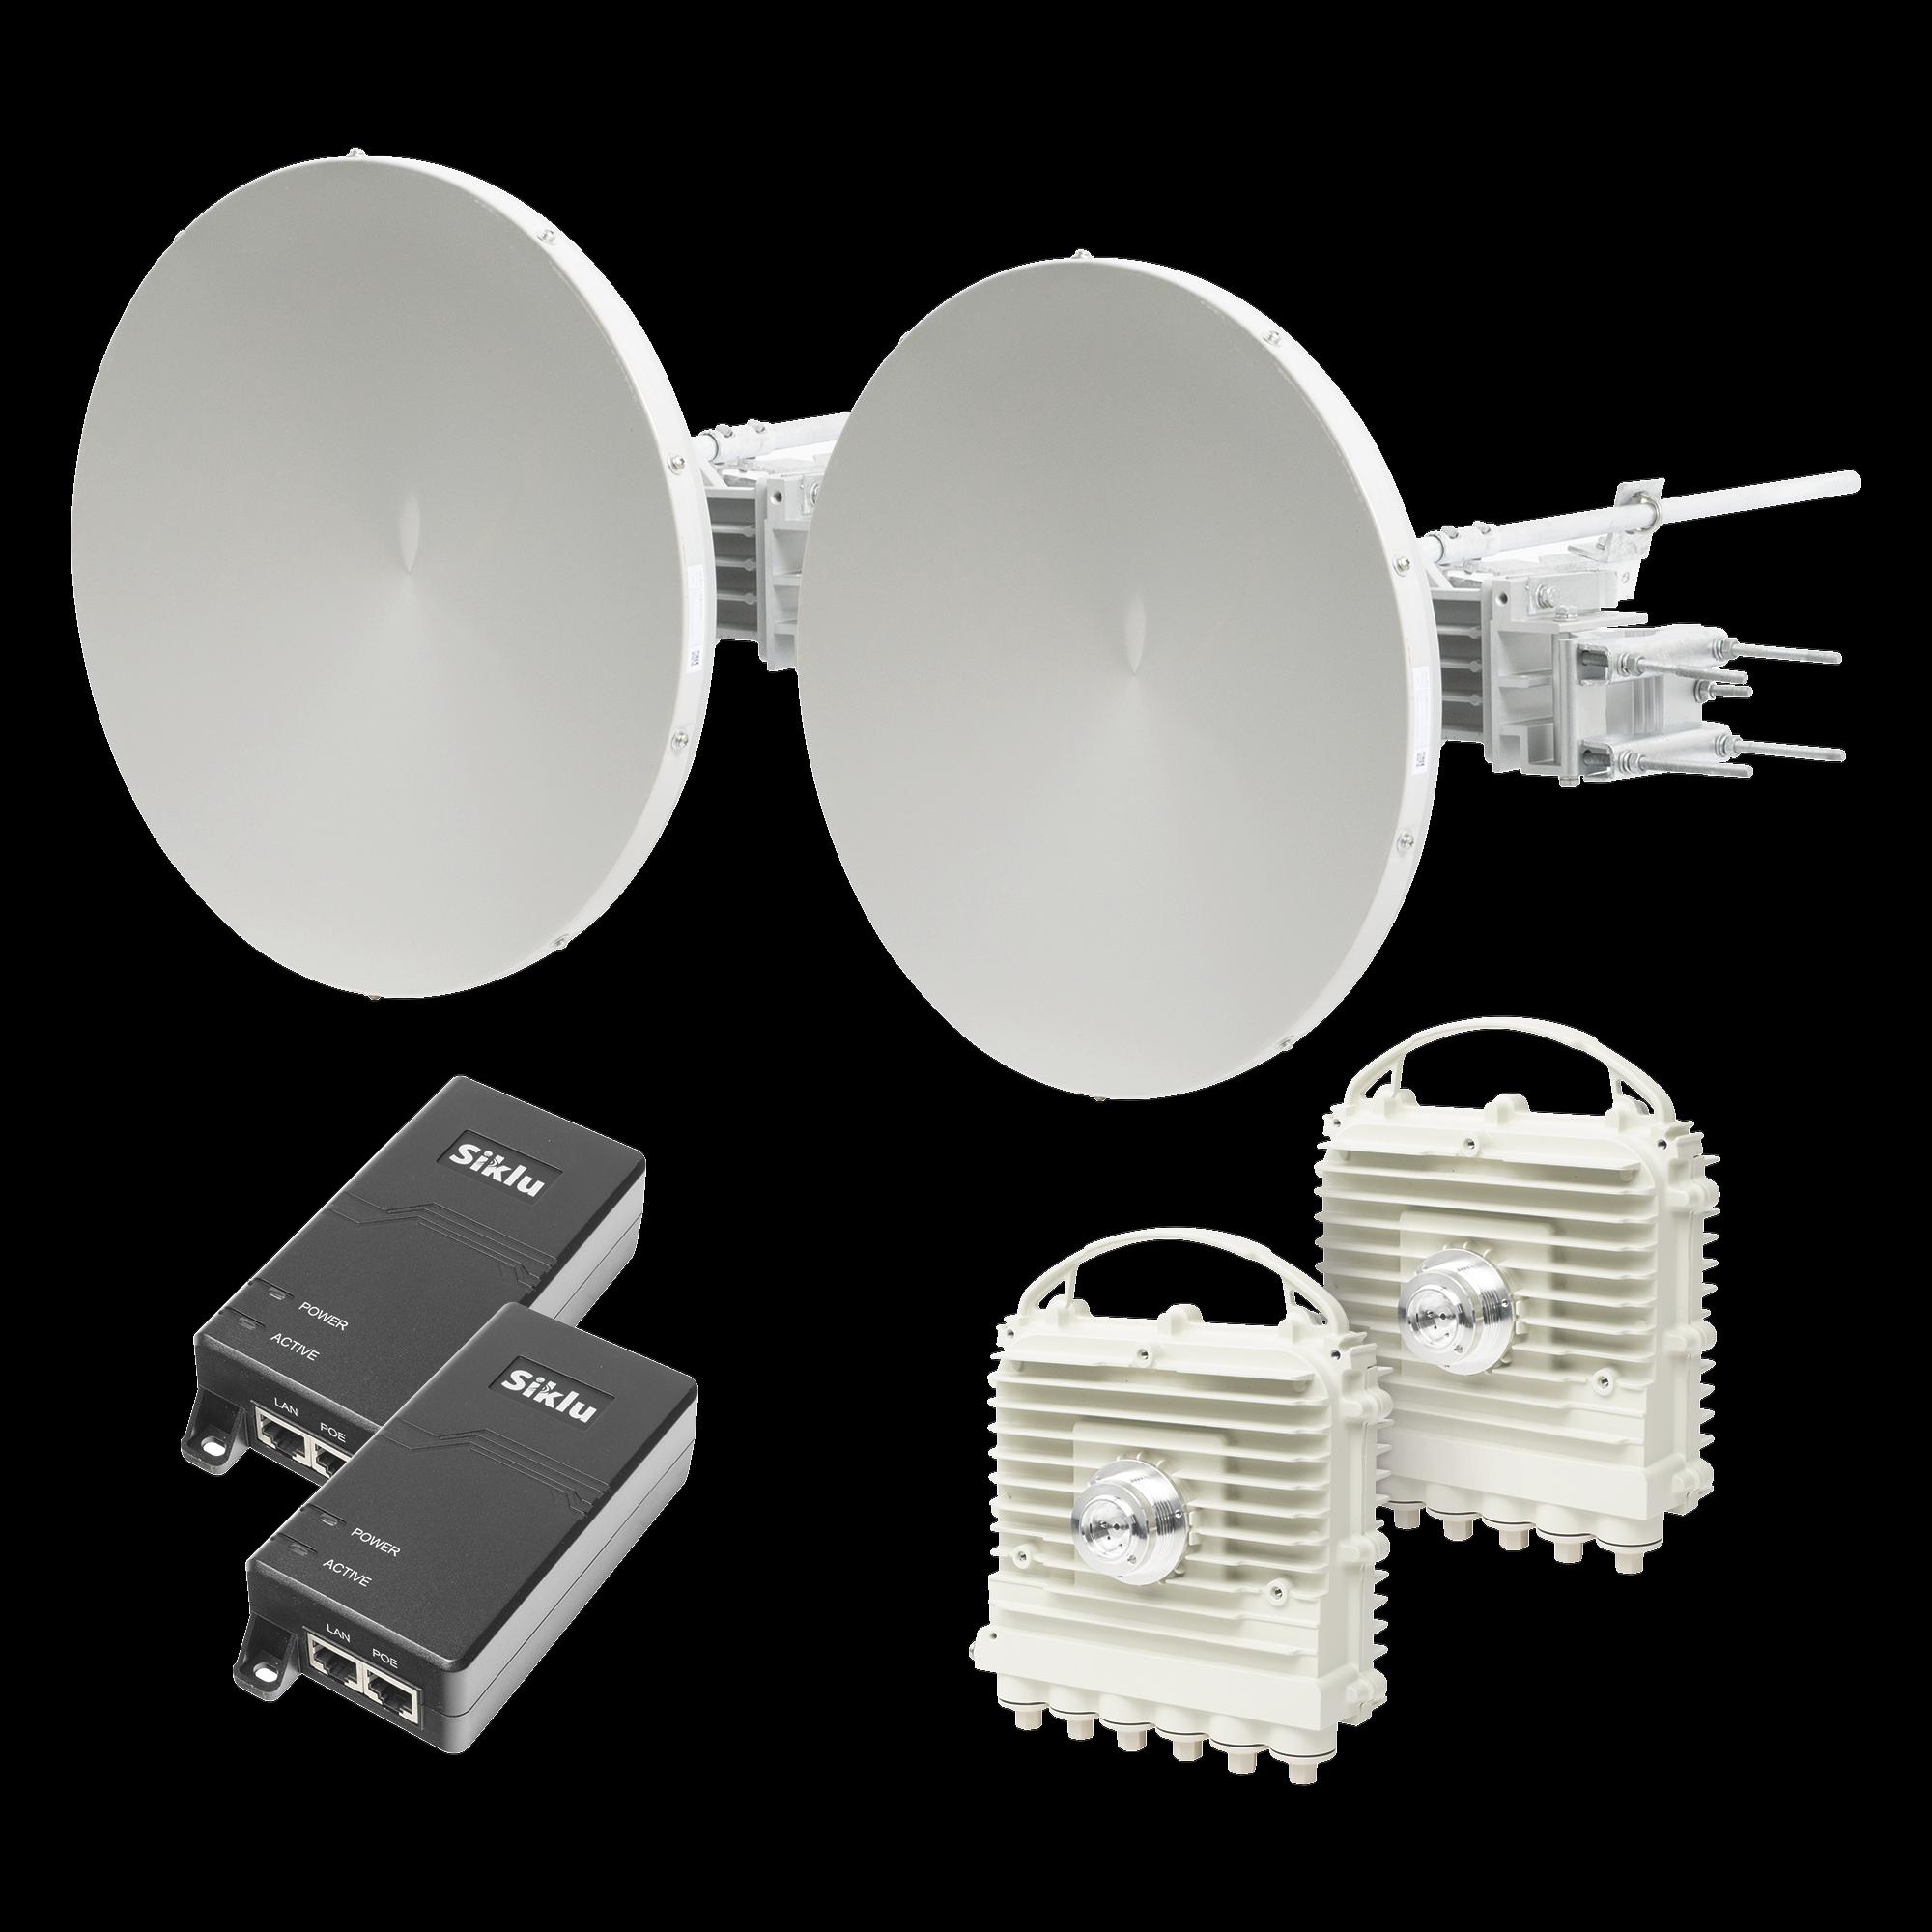 Enlace de Backhaul Completo Serie Kilo-EherHaul? EH-1200FX, Antenas de 2 ft, hasta 1 Gbps reales Full Duplex - Banda Libre en México